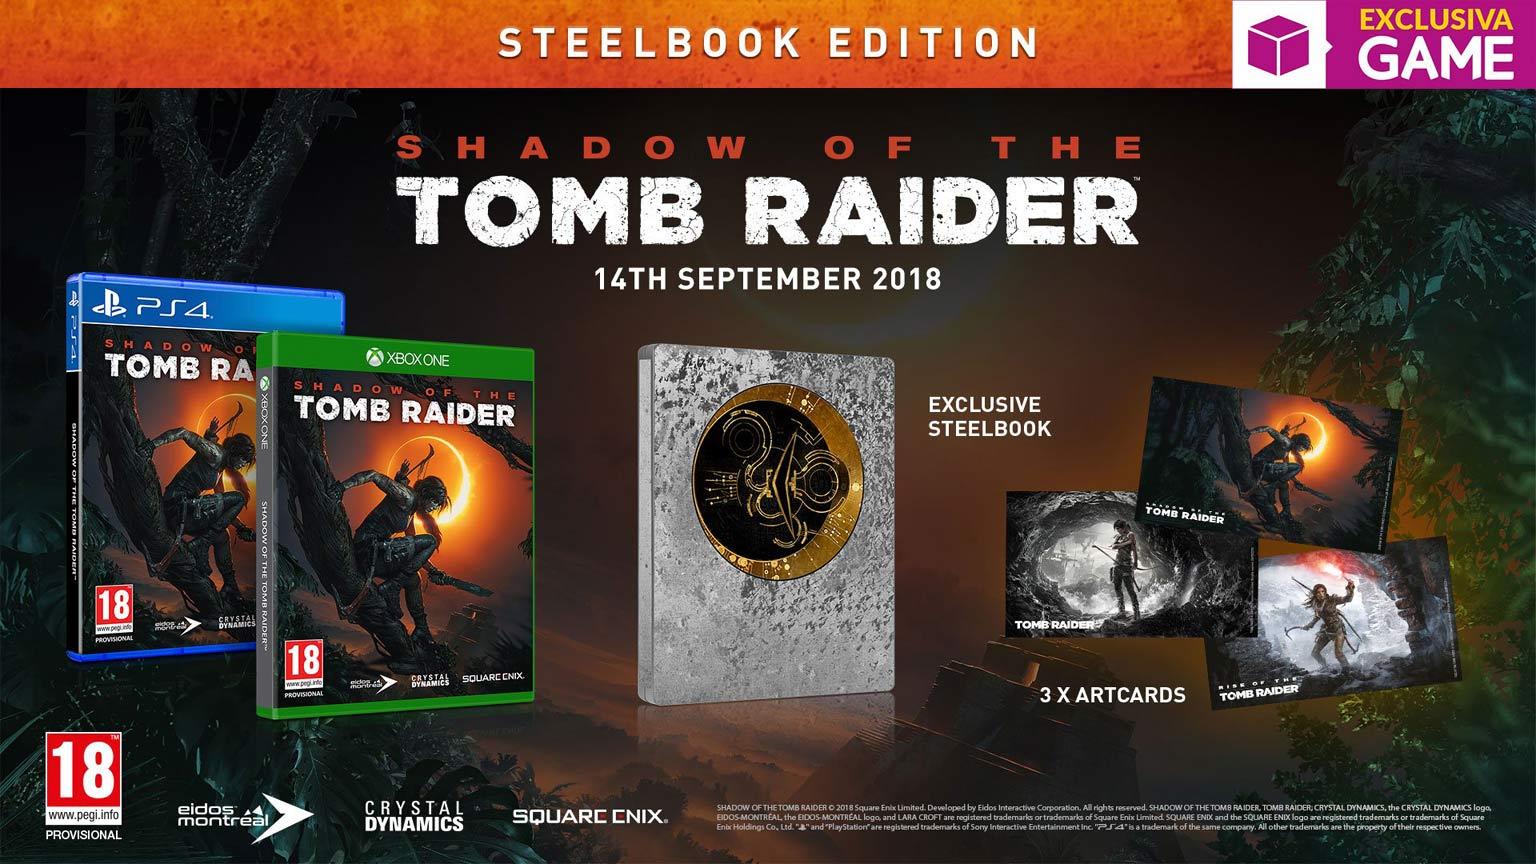 Shadow-of-the-Tomb-Raider-steelbook